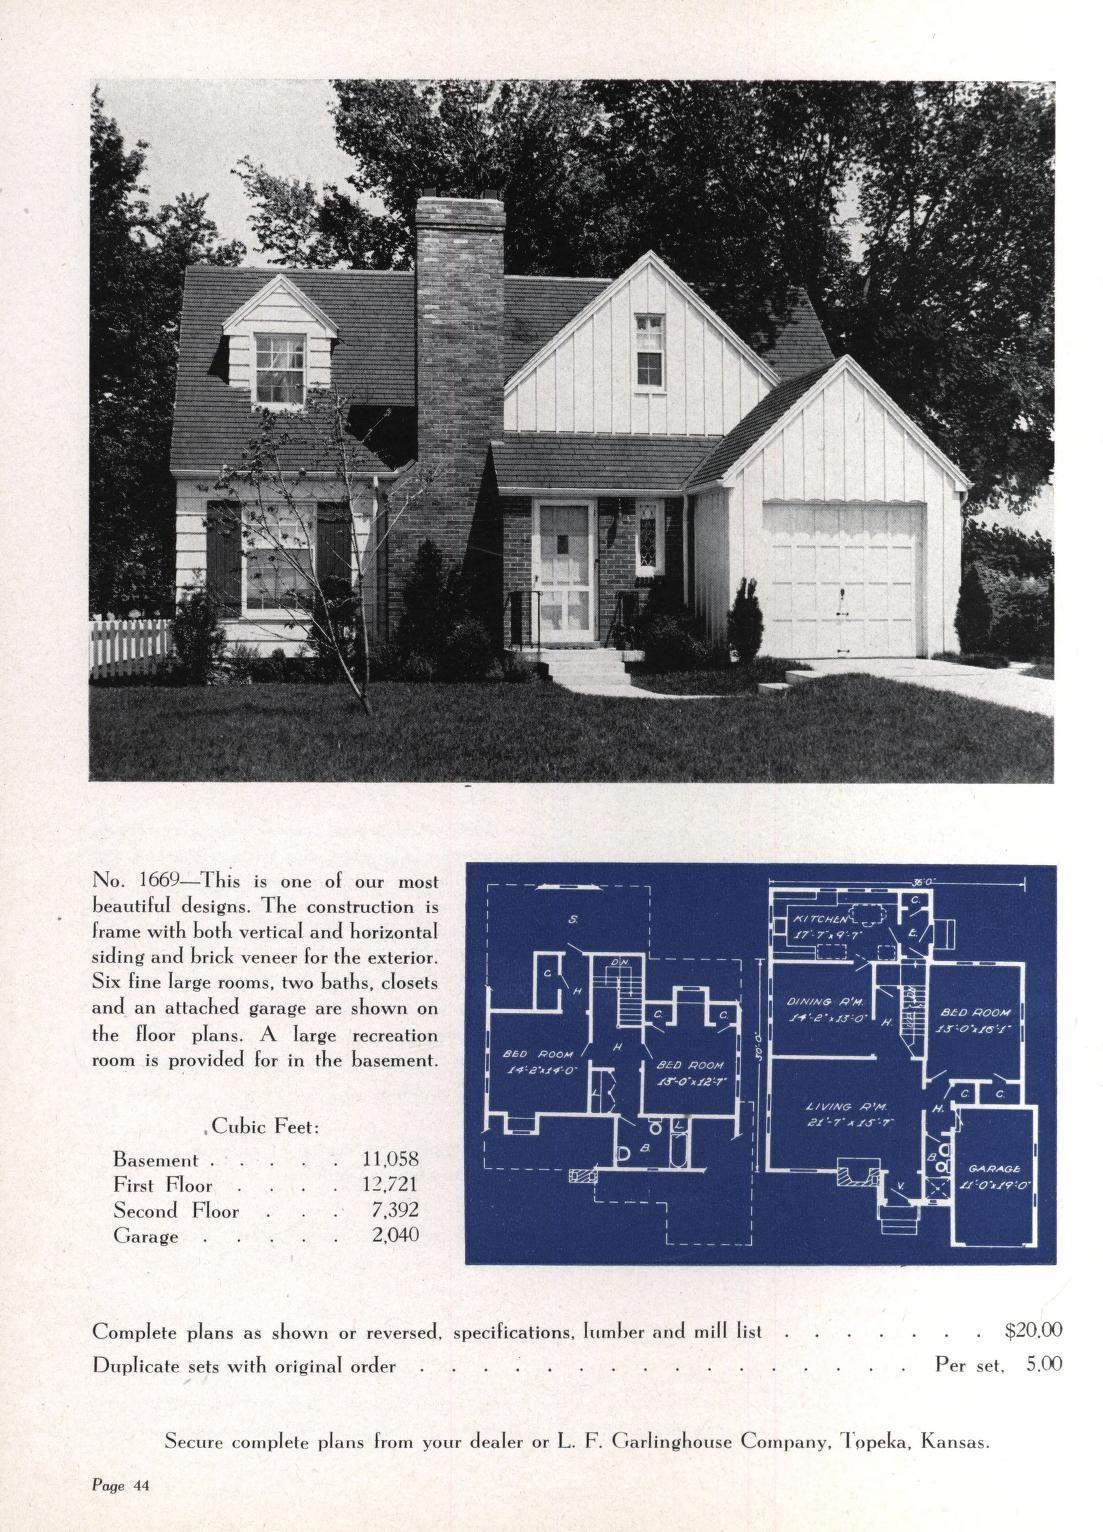 Artistic Homes 6th Ed In 2020 Vintage House Plans Minecraft House Plans Brick Veneer